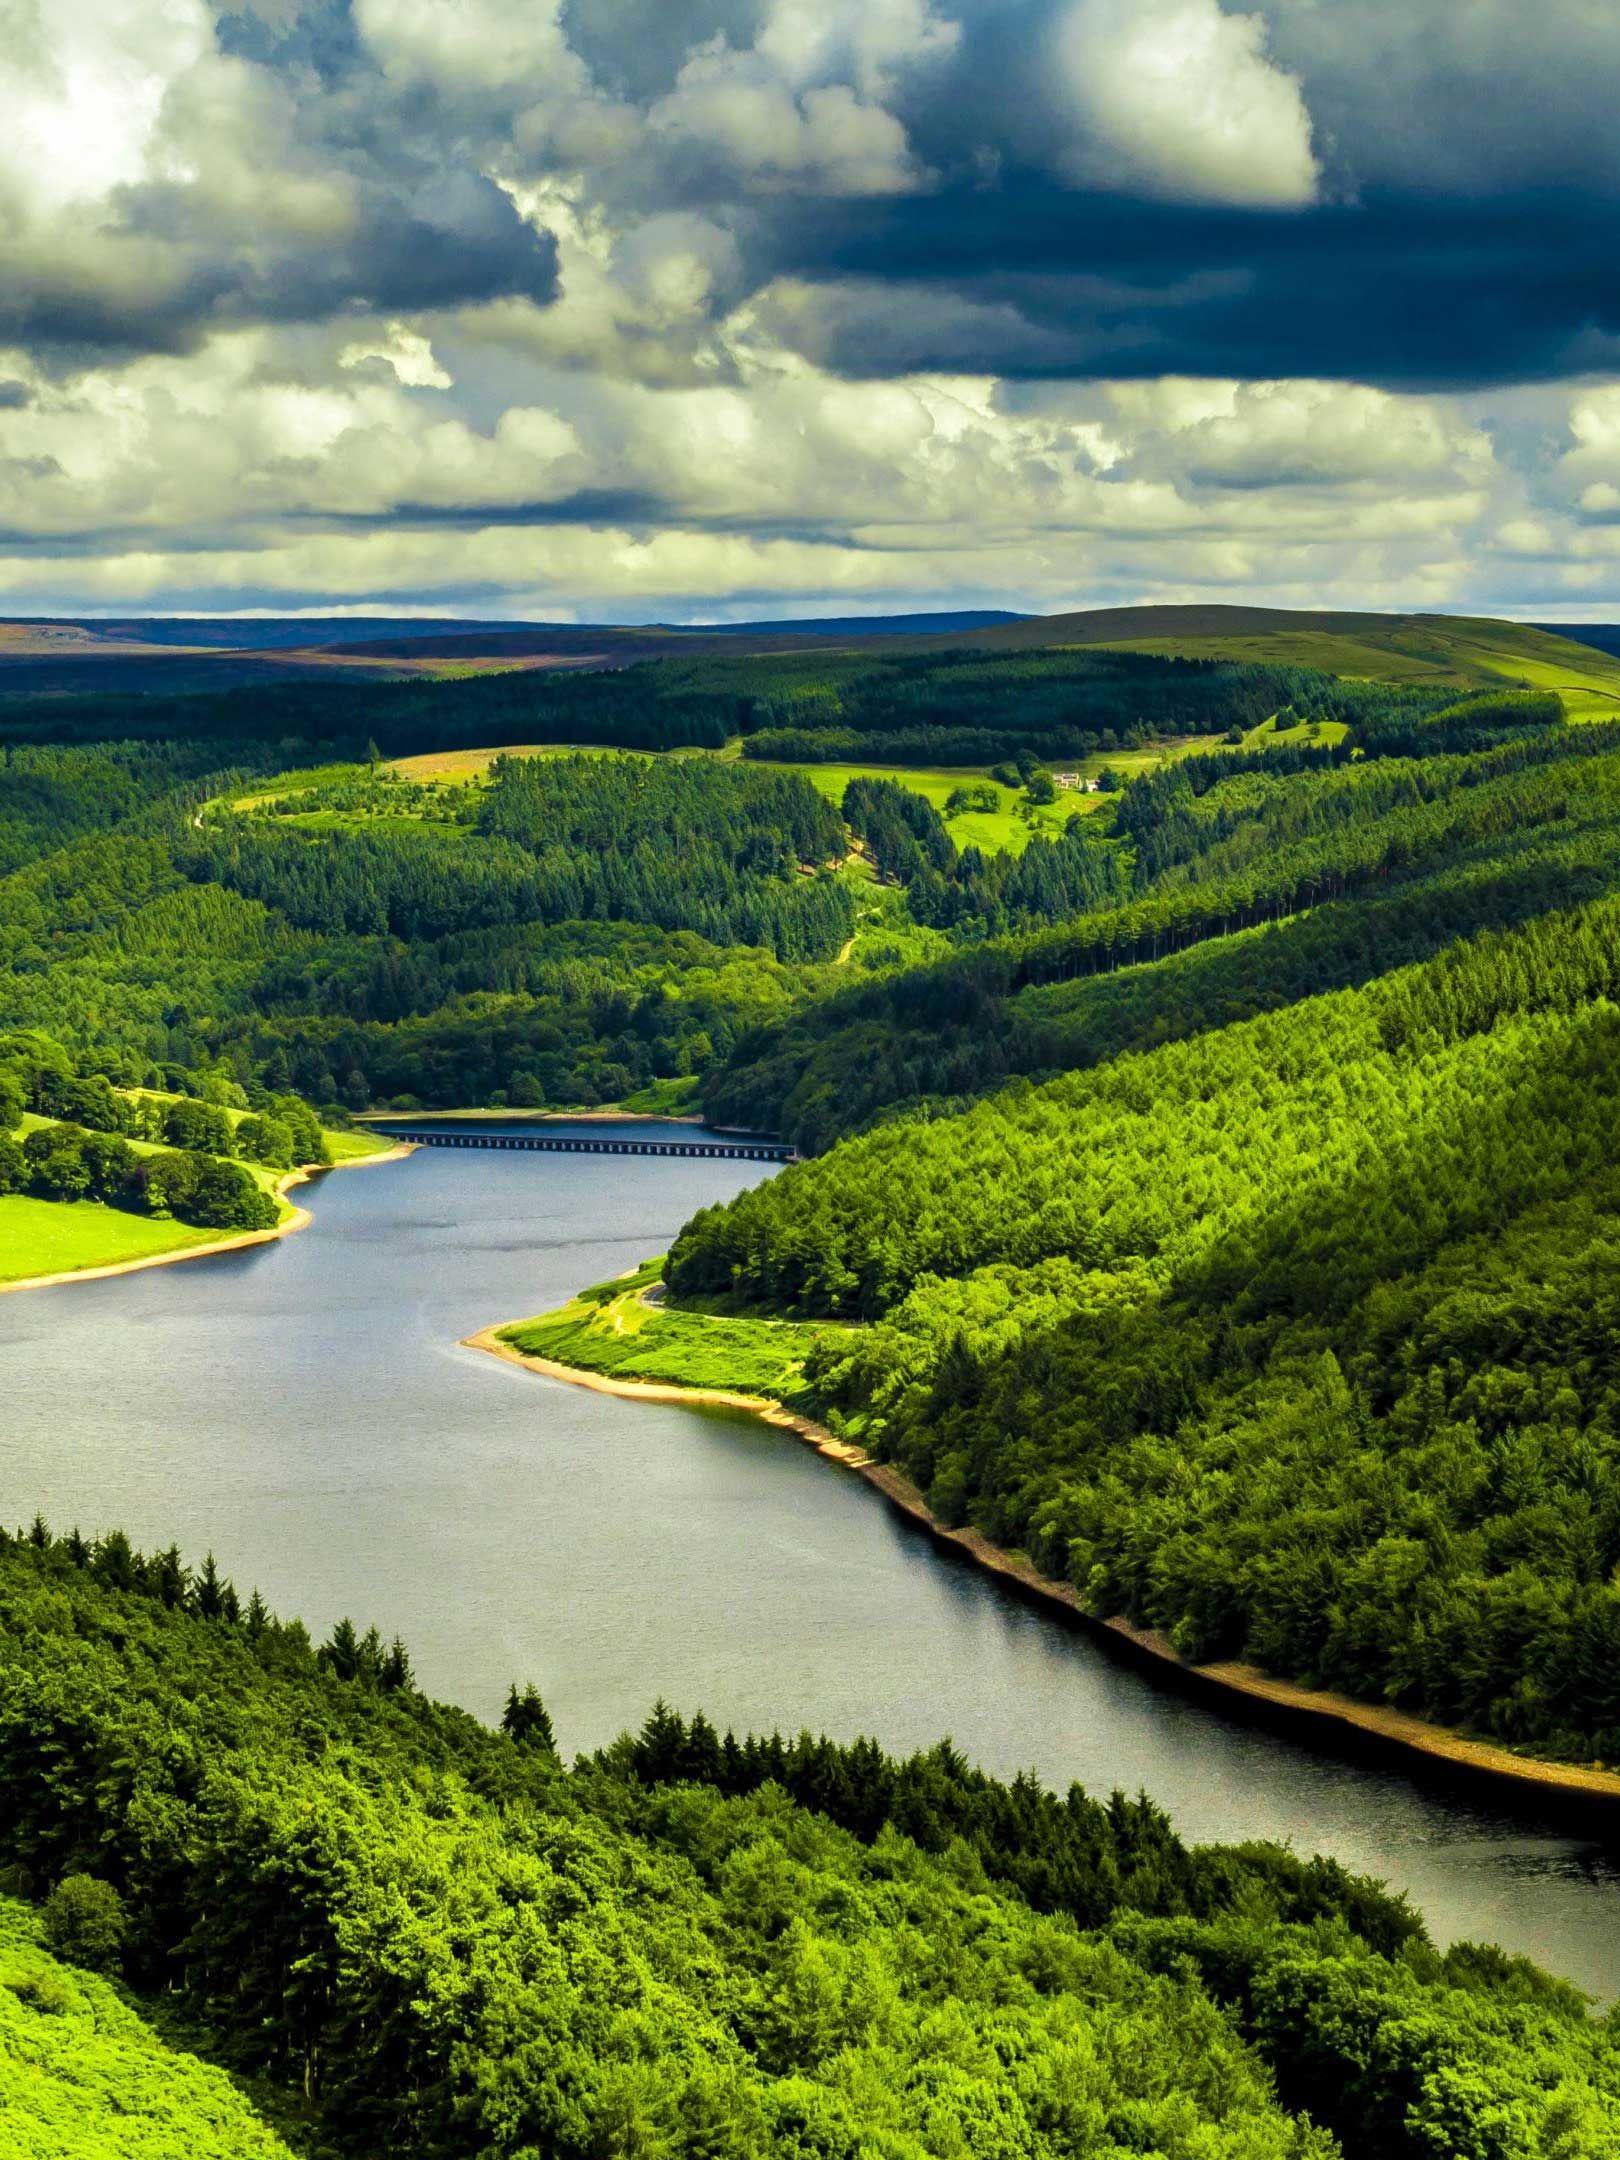 Uk K Hd Wallpaper Hills River Trees Sky Ipad Air Wallpaper Hd In 2020 Ipad Air Wallpaper Hd Wallpaper Mountain Wallpaper